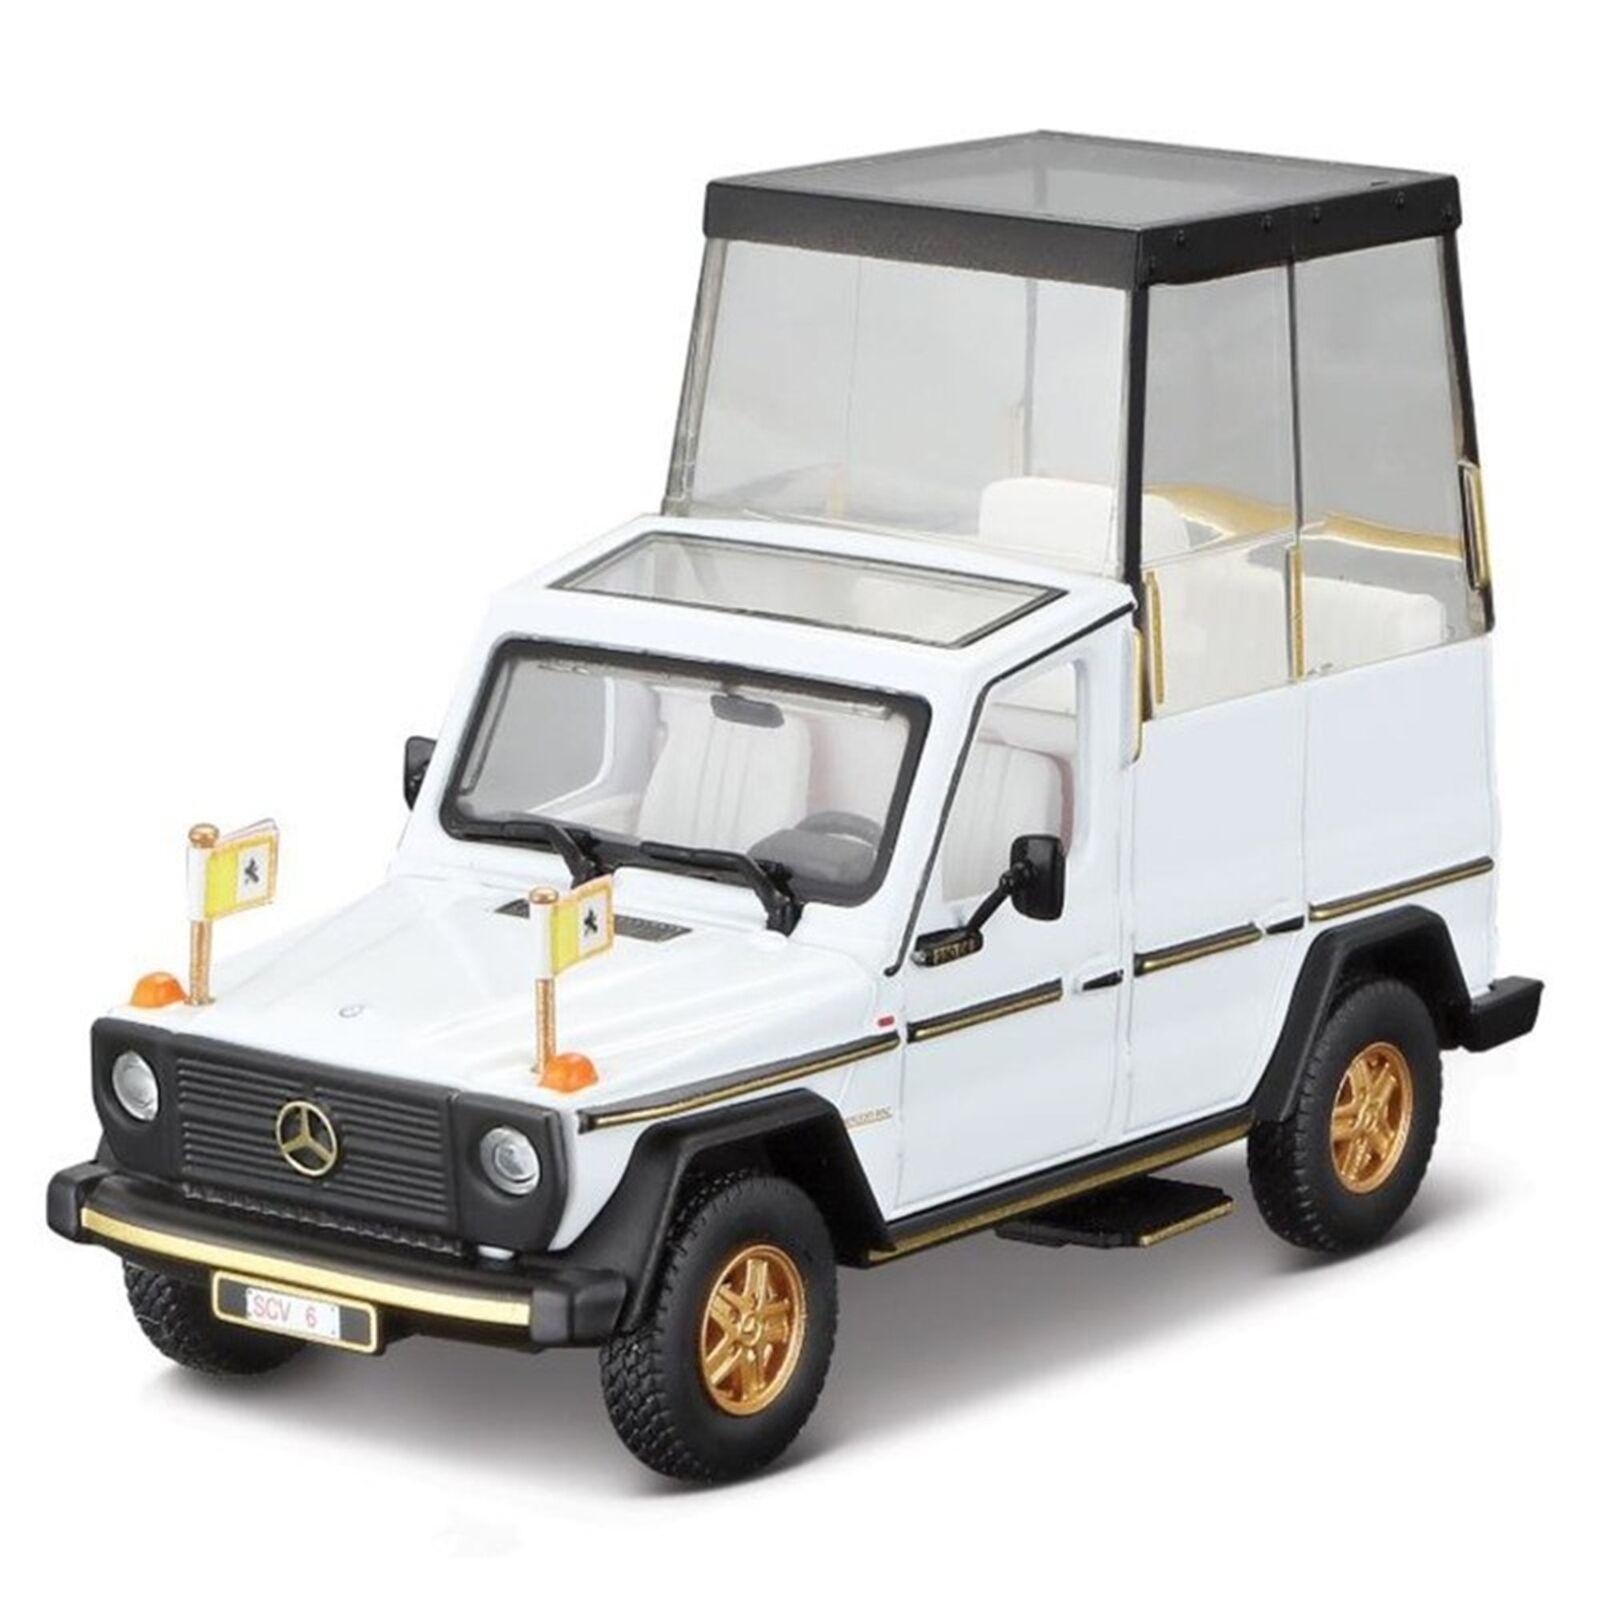 Bburago Street Fire 1:43 Model 1 Car Toy Childs Kids Gift Car Chosen At Random